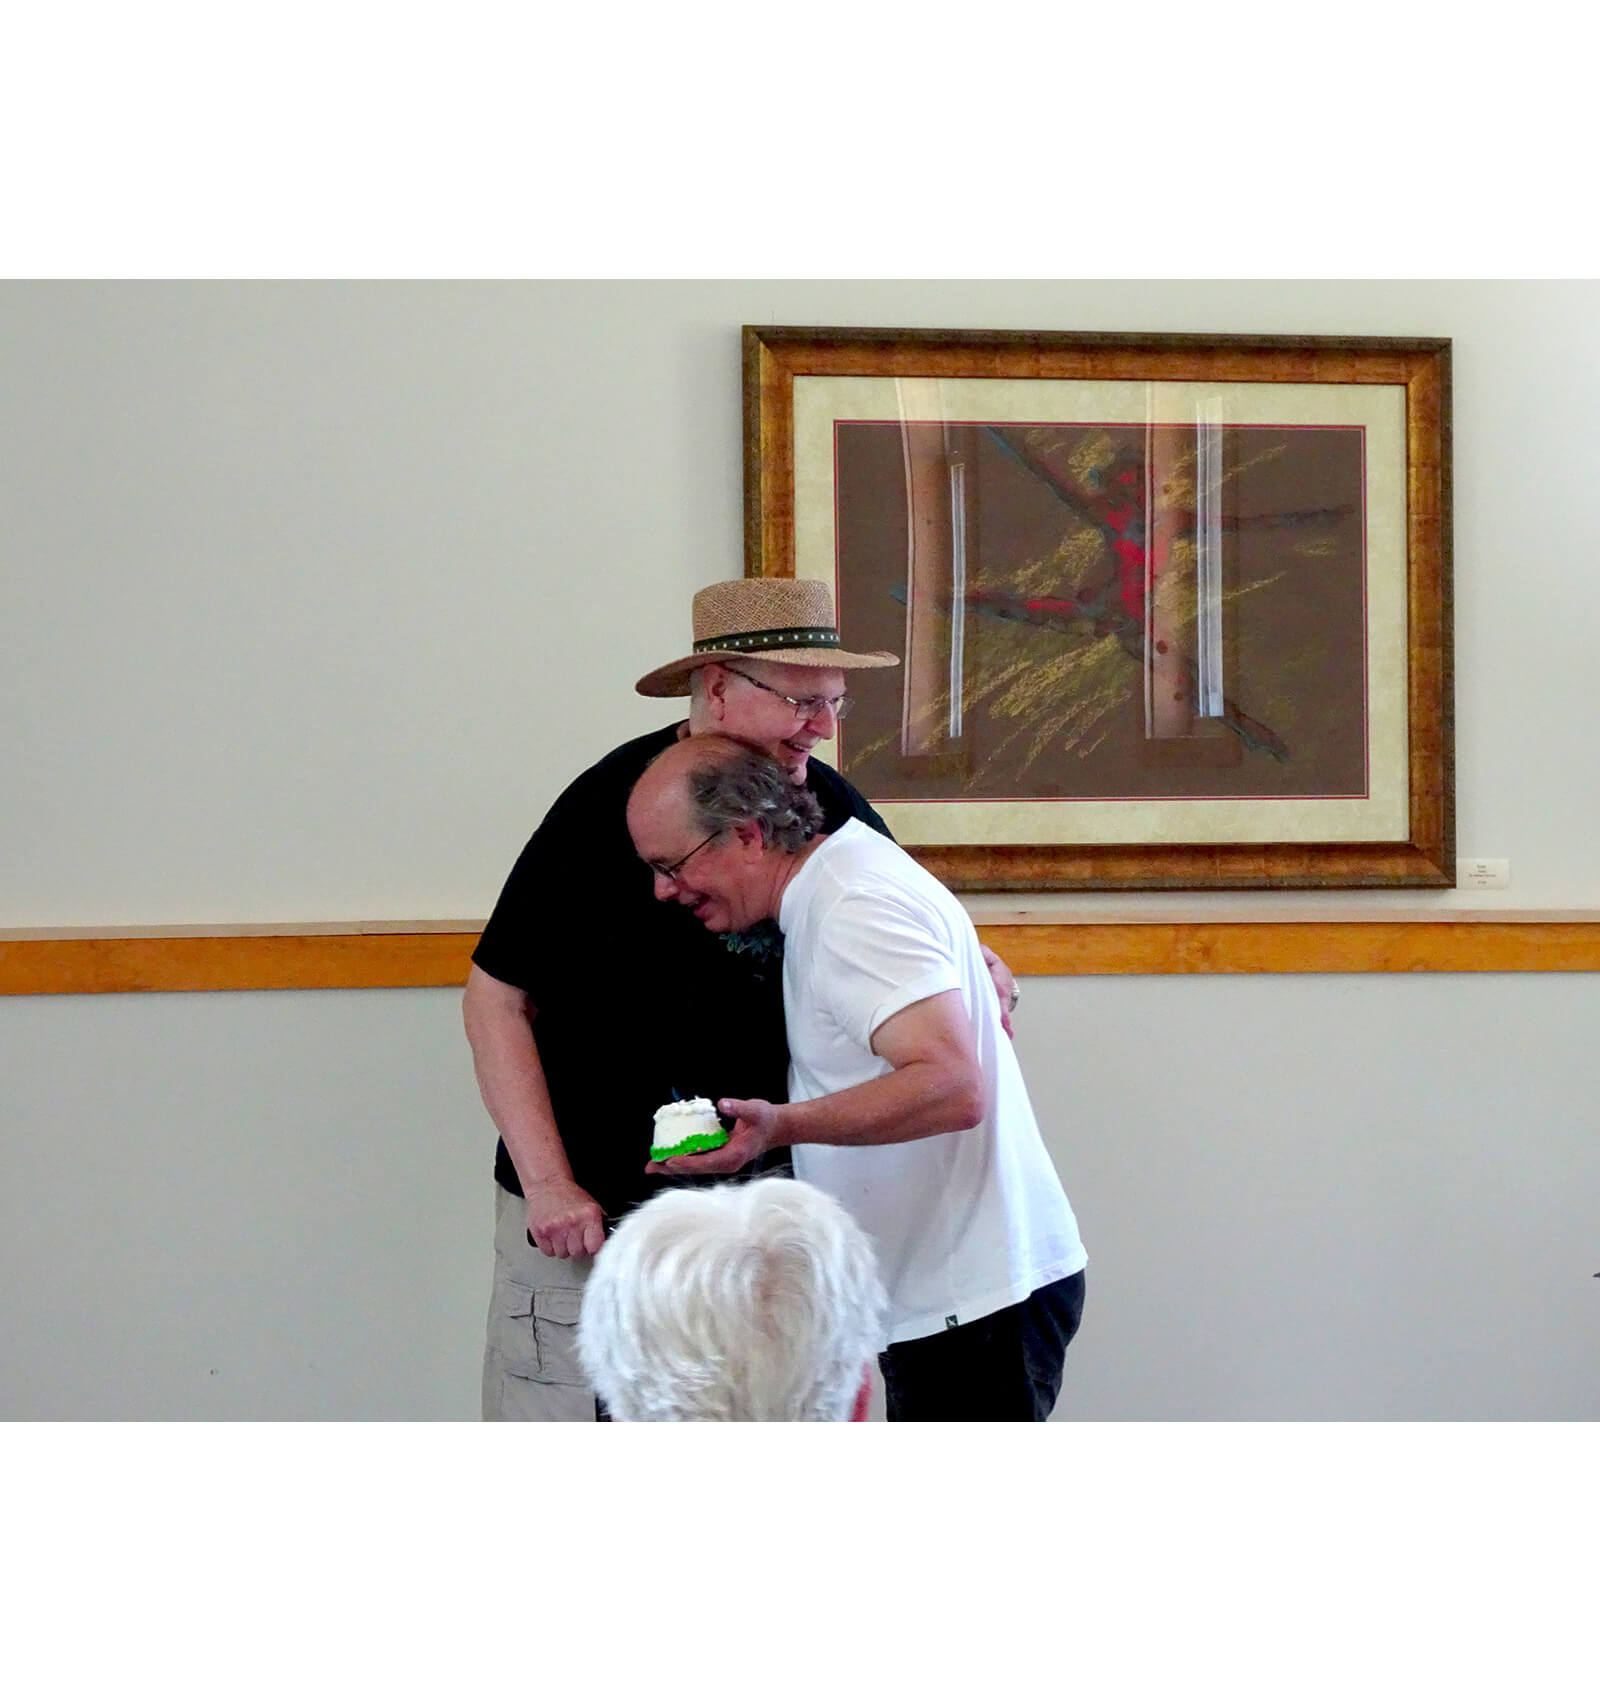 Andrew hugs John Jesse after John gives him a birthday cake!